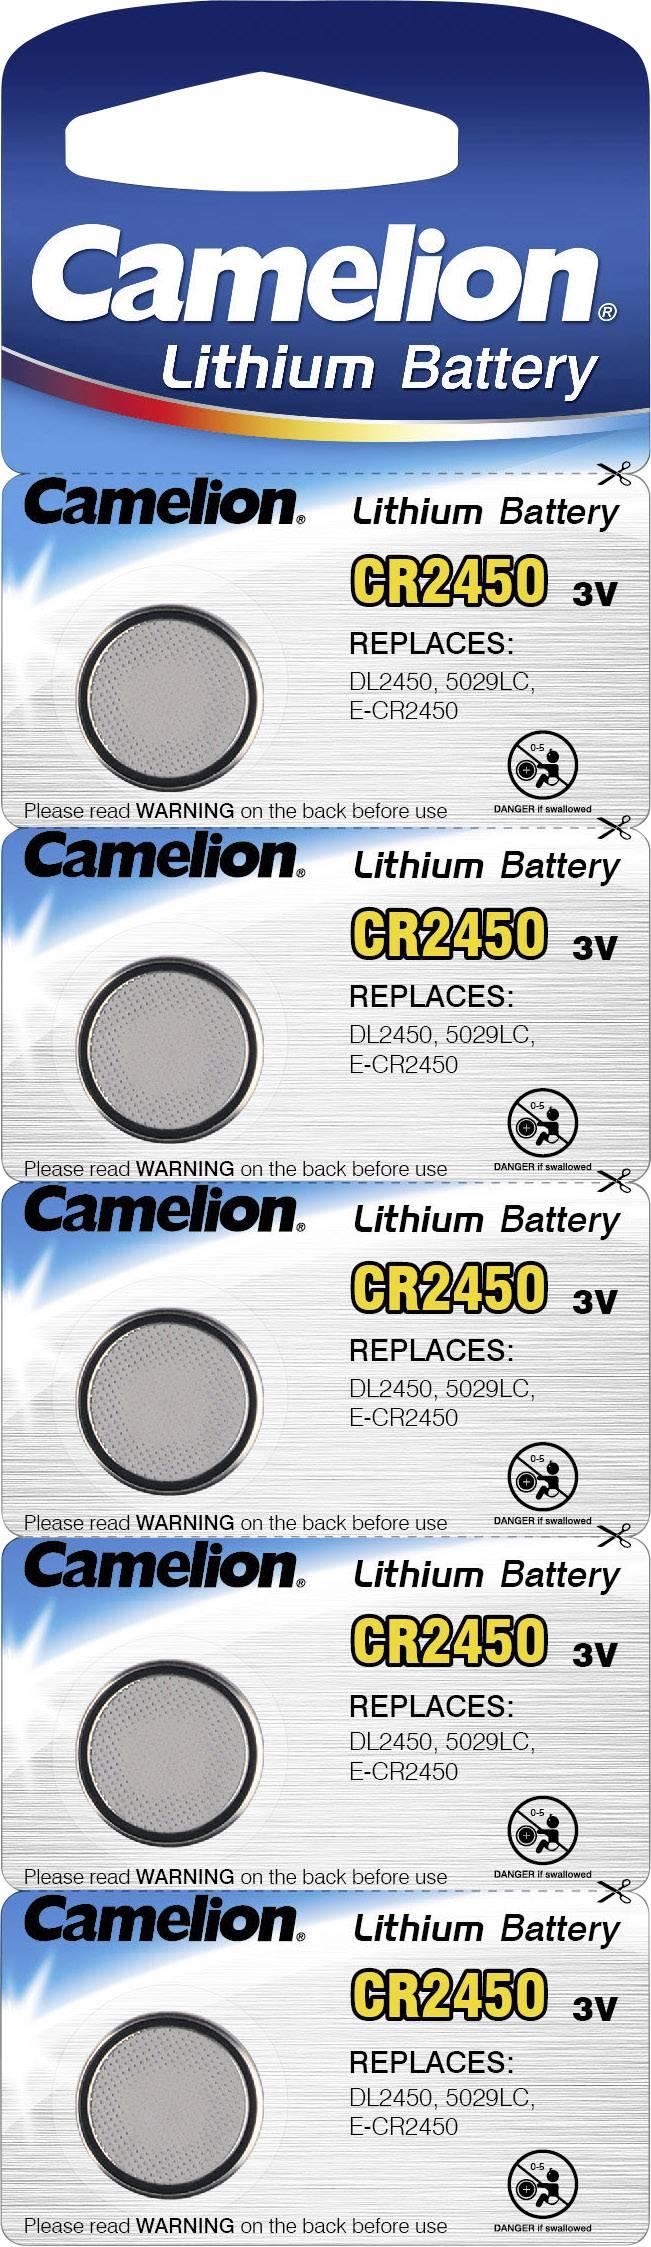 Camelion CR2450 Knopfzelle CR 2450 Lithium 550 mAh 3 V 5 St.